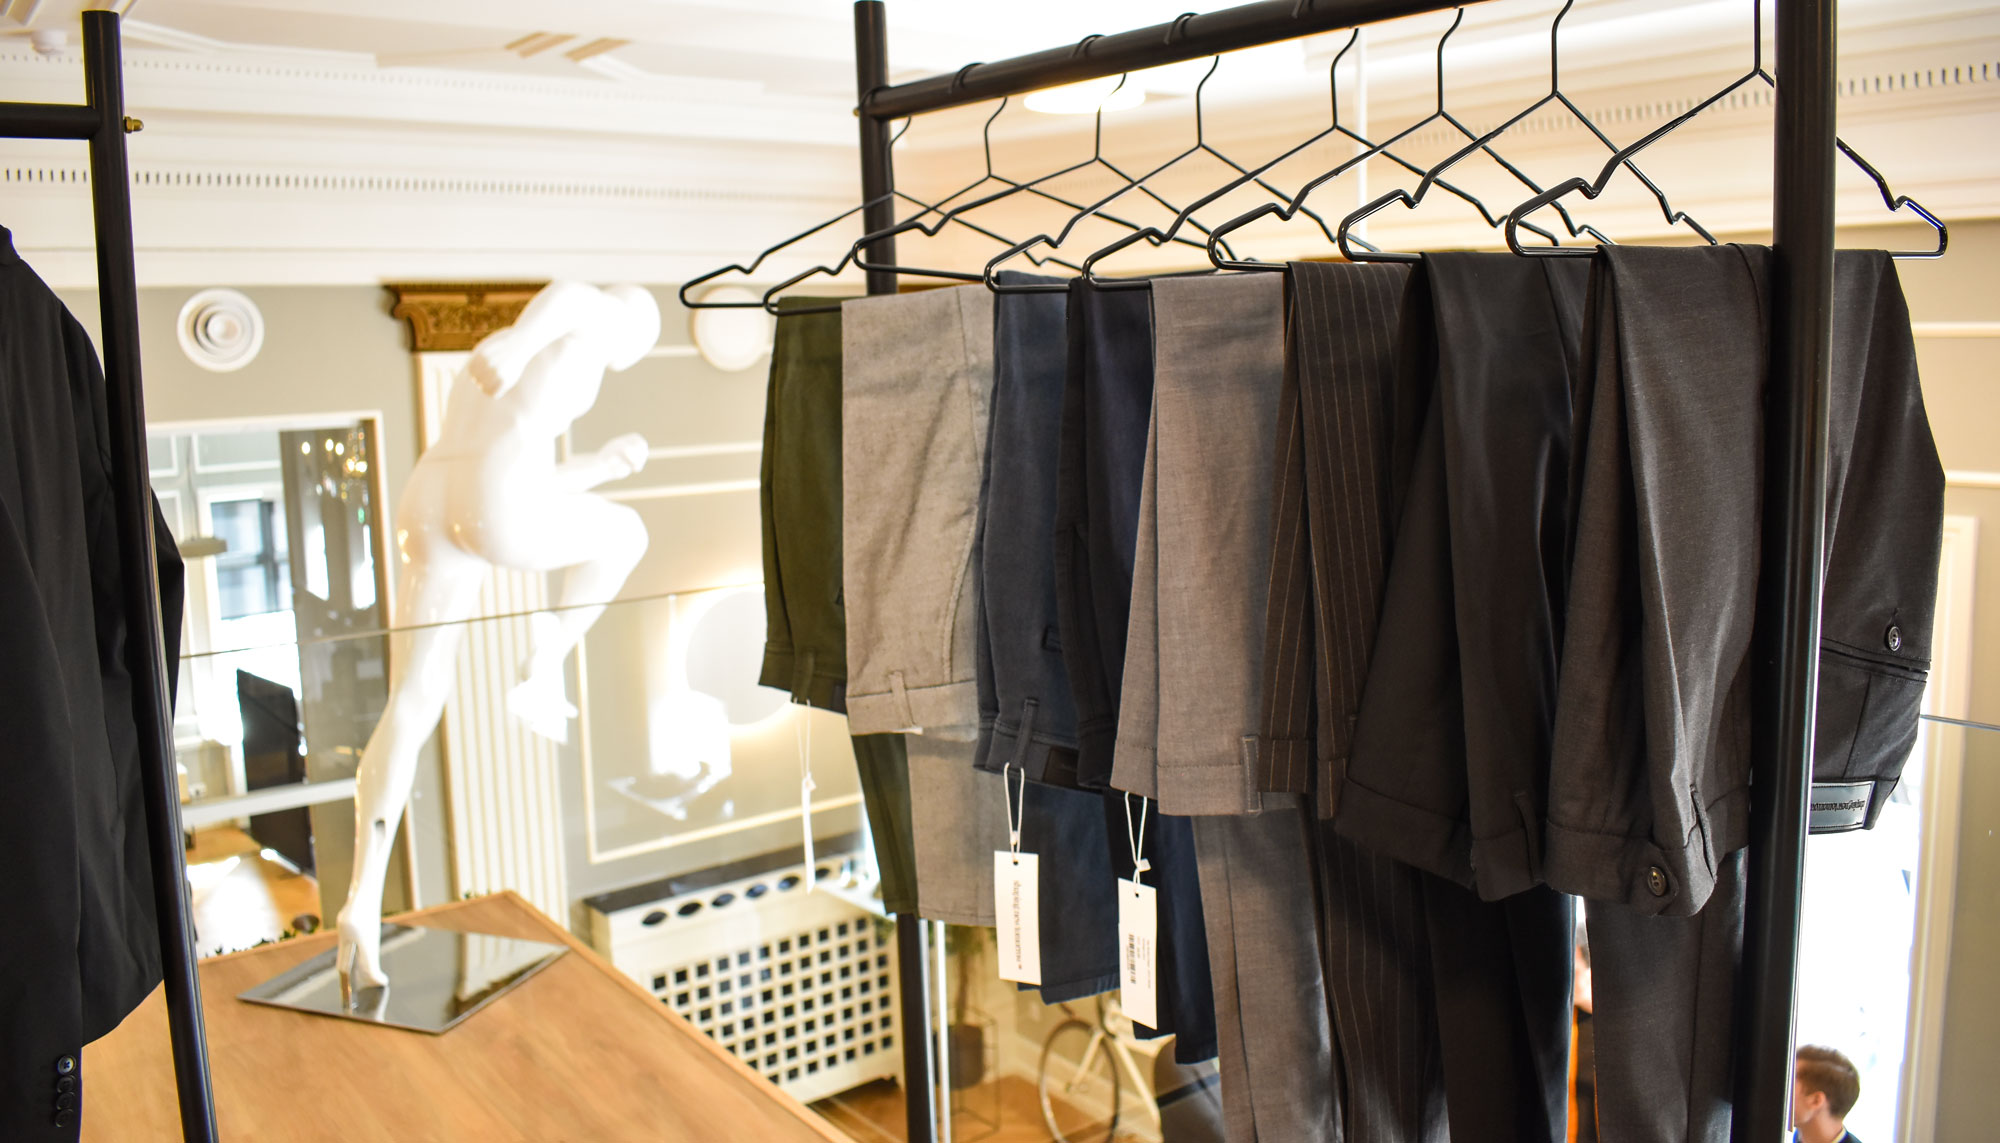 Shaping new tomorrow i nye klæder: Er det her Aalborgs vildeste kontor?